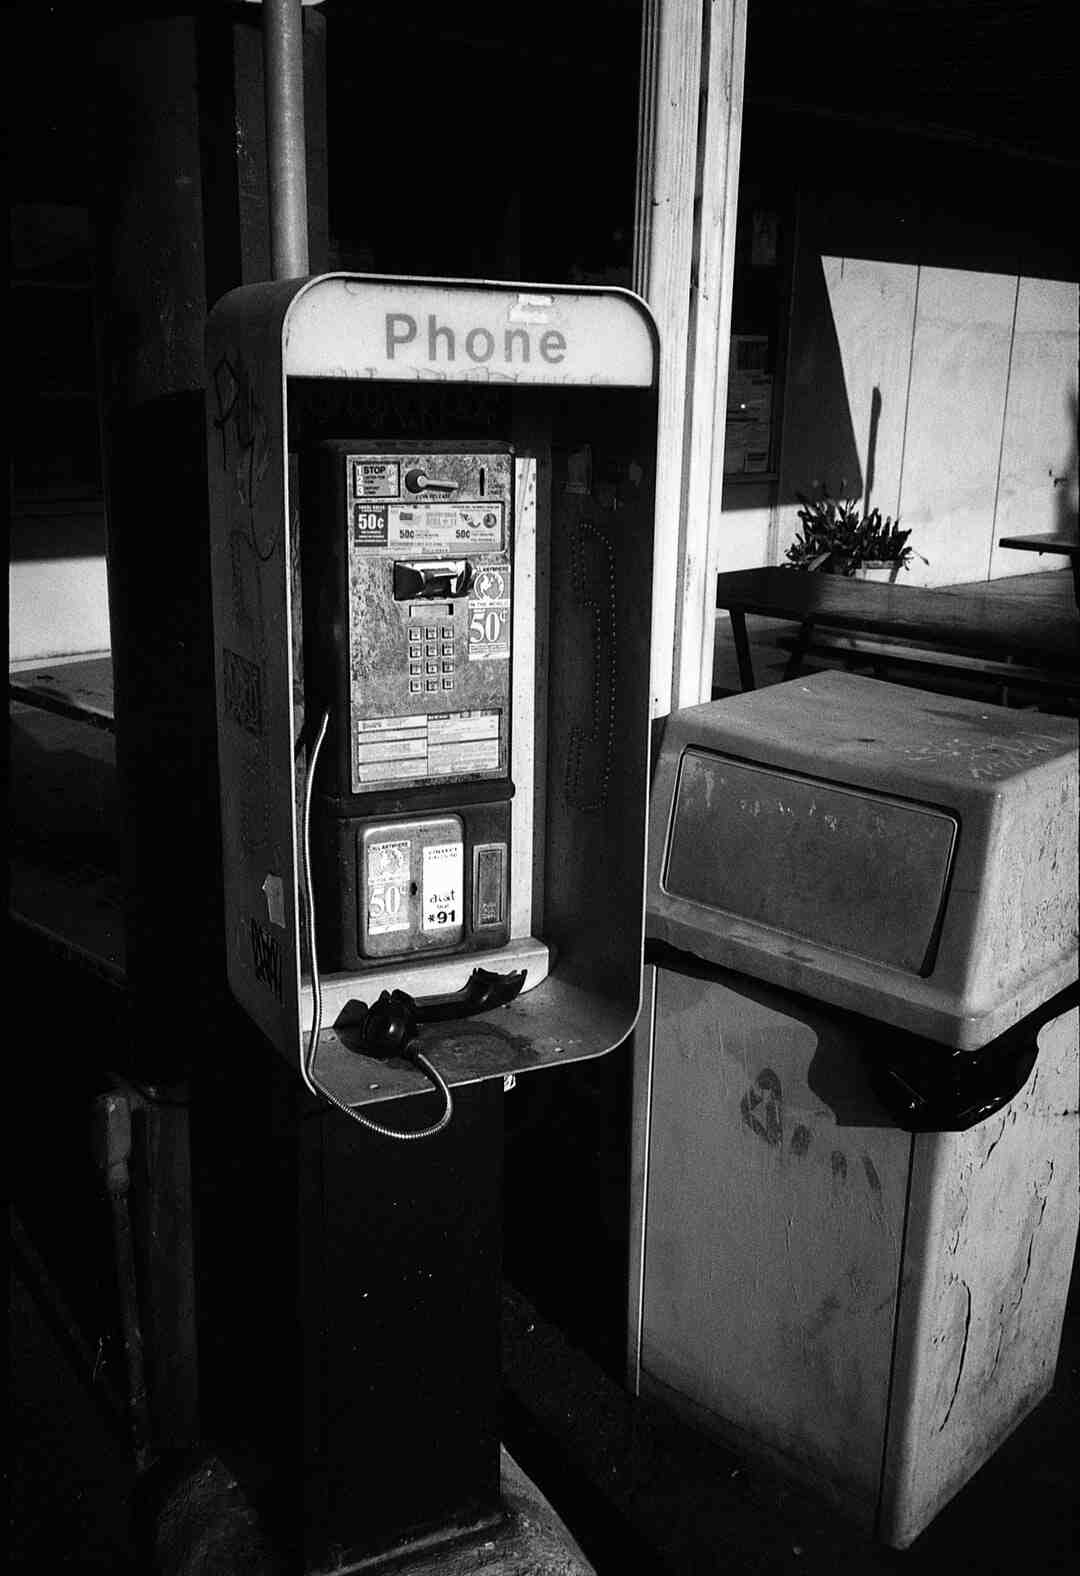 How to use landline phone